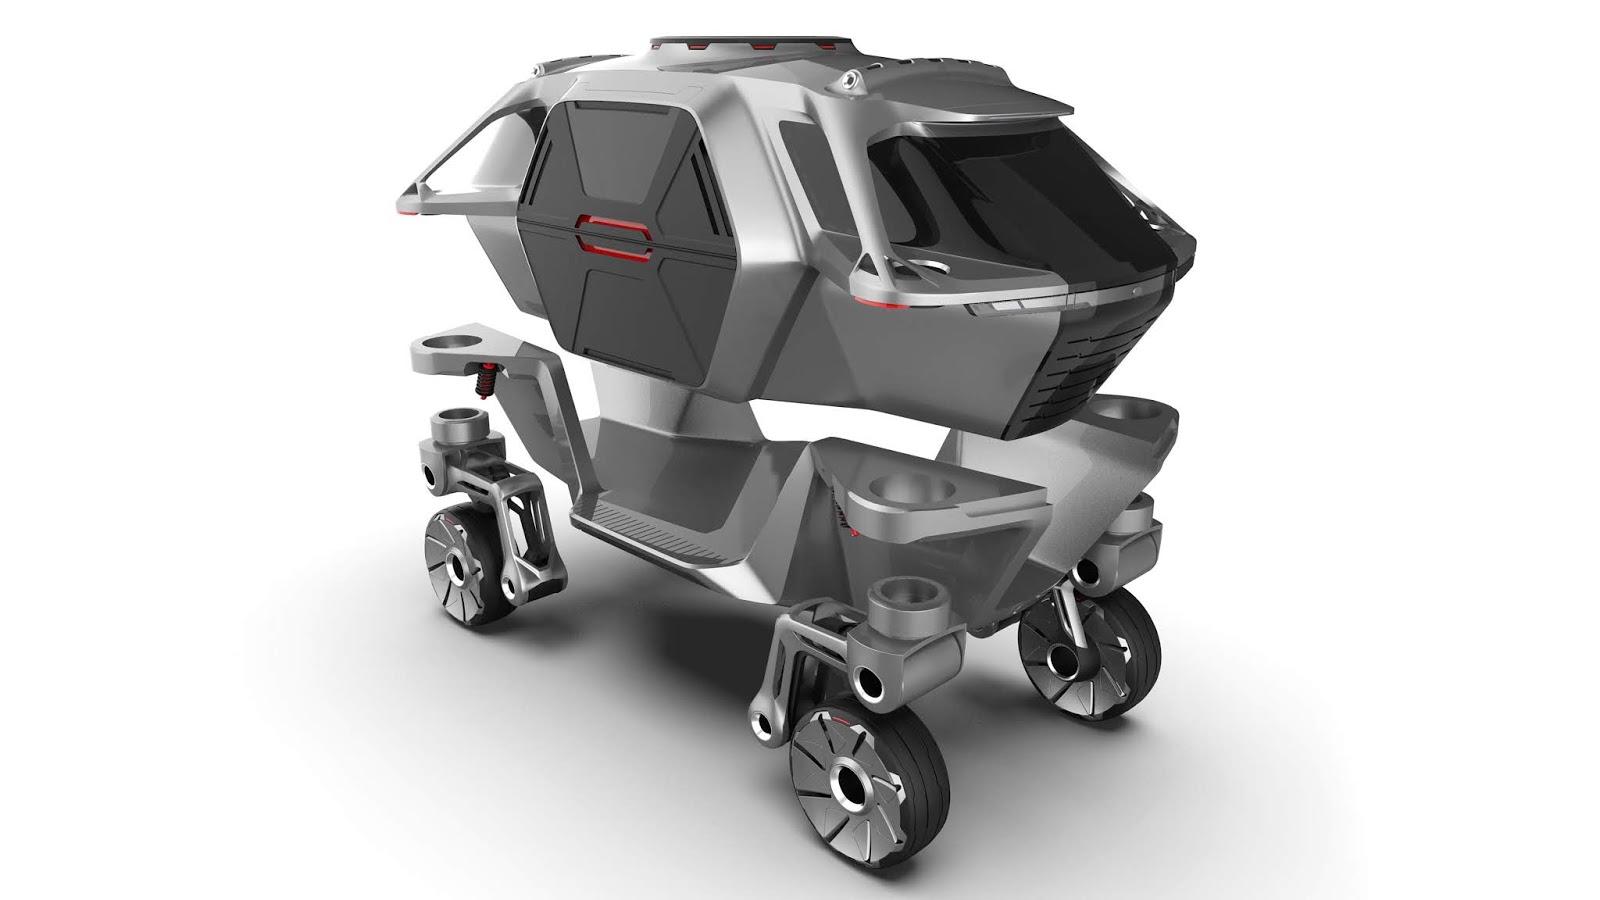 hyundai elevate concept252842529 H Hyundai έβγαλε όχημα με ρομποτικά πόδια! Electric cars, Hyundai, zblog, Τεχνολογία